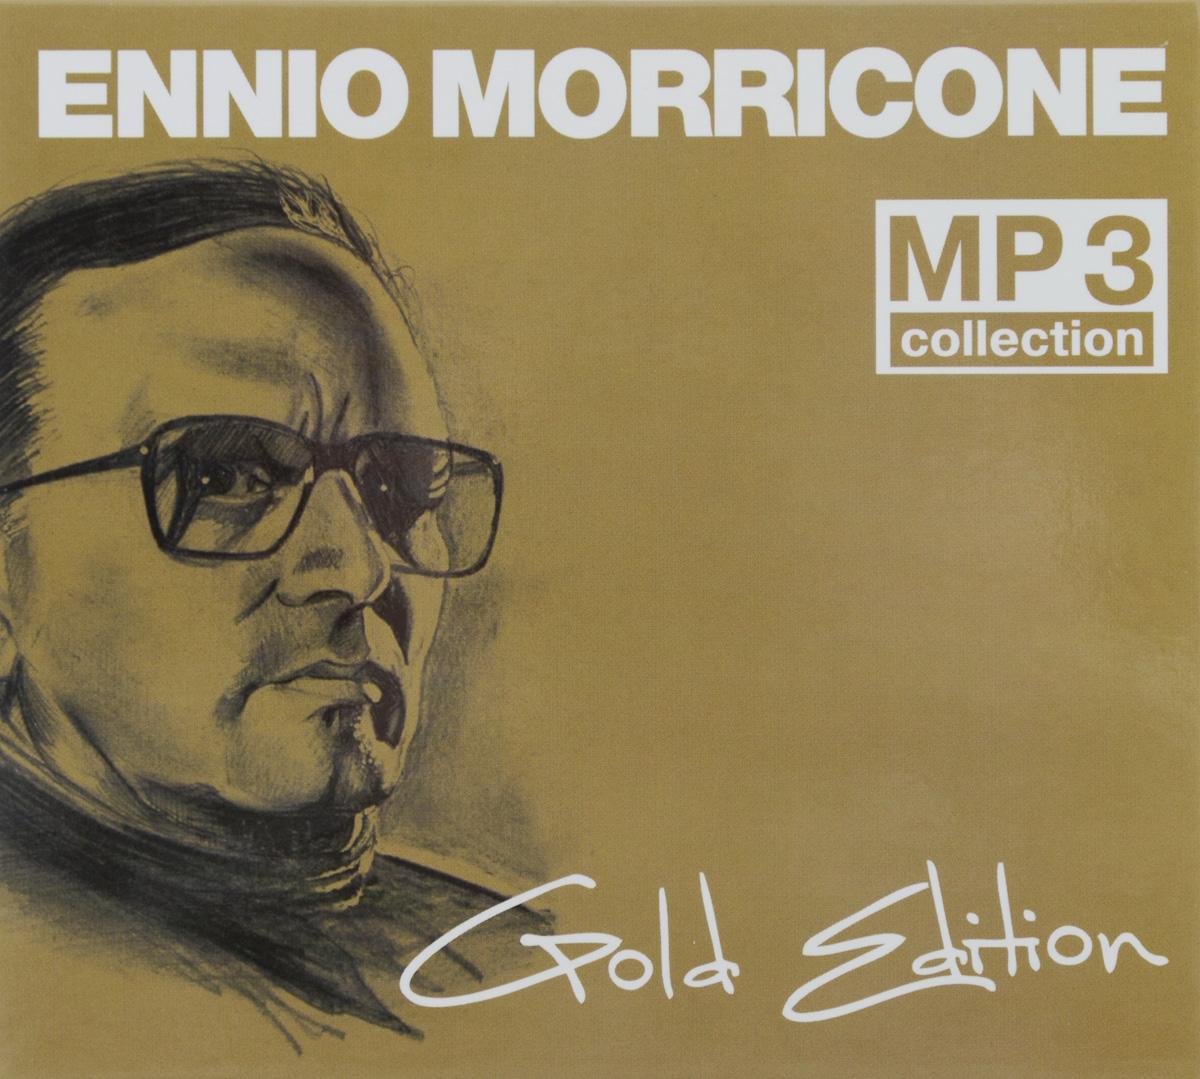 Эннио Морриконе,Il Novecento,Maddalena,Mosca Addio,La Cugina Ennio Morricone. MP3 Collection. Gold Edition (mp3) mp3 ep14w